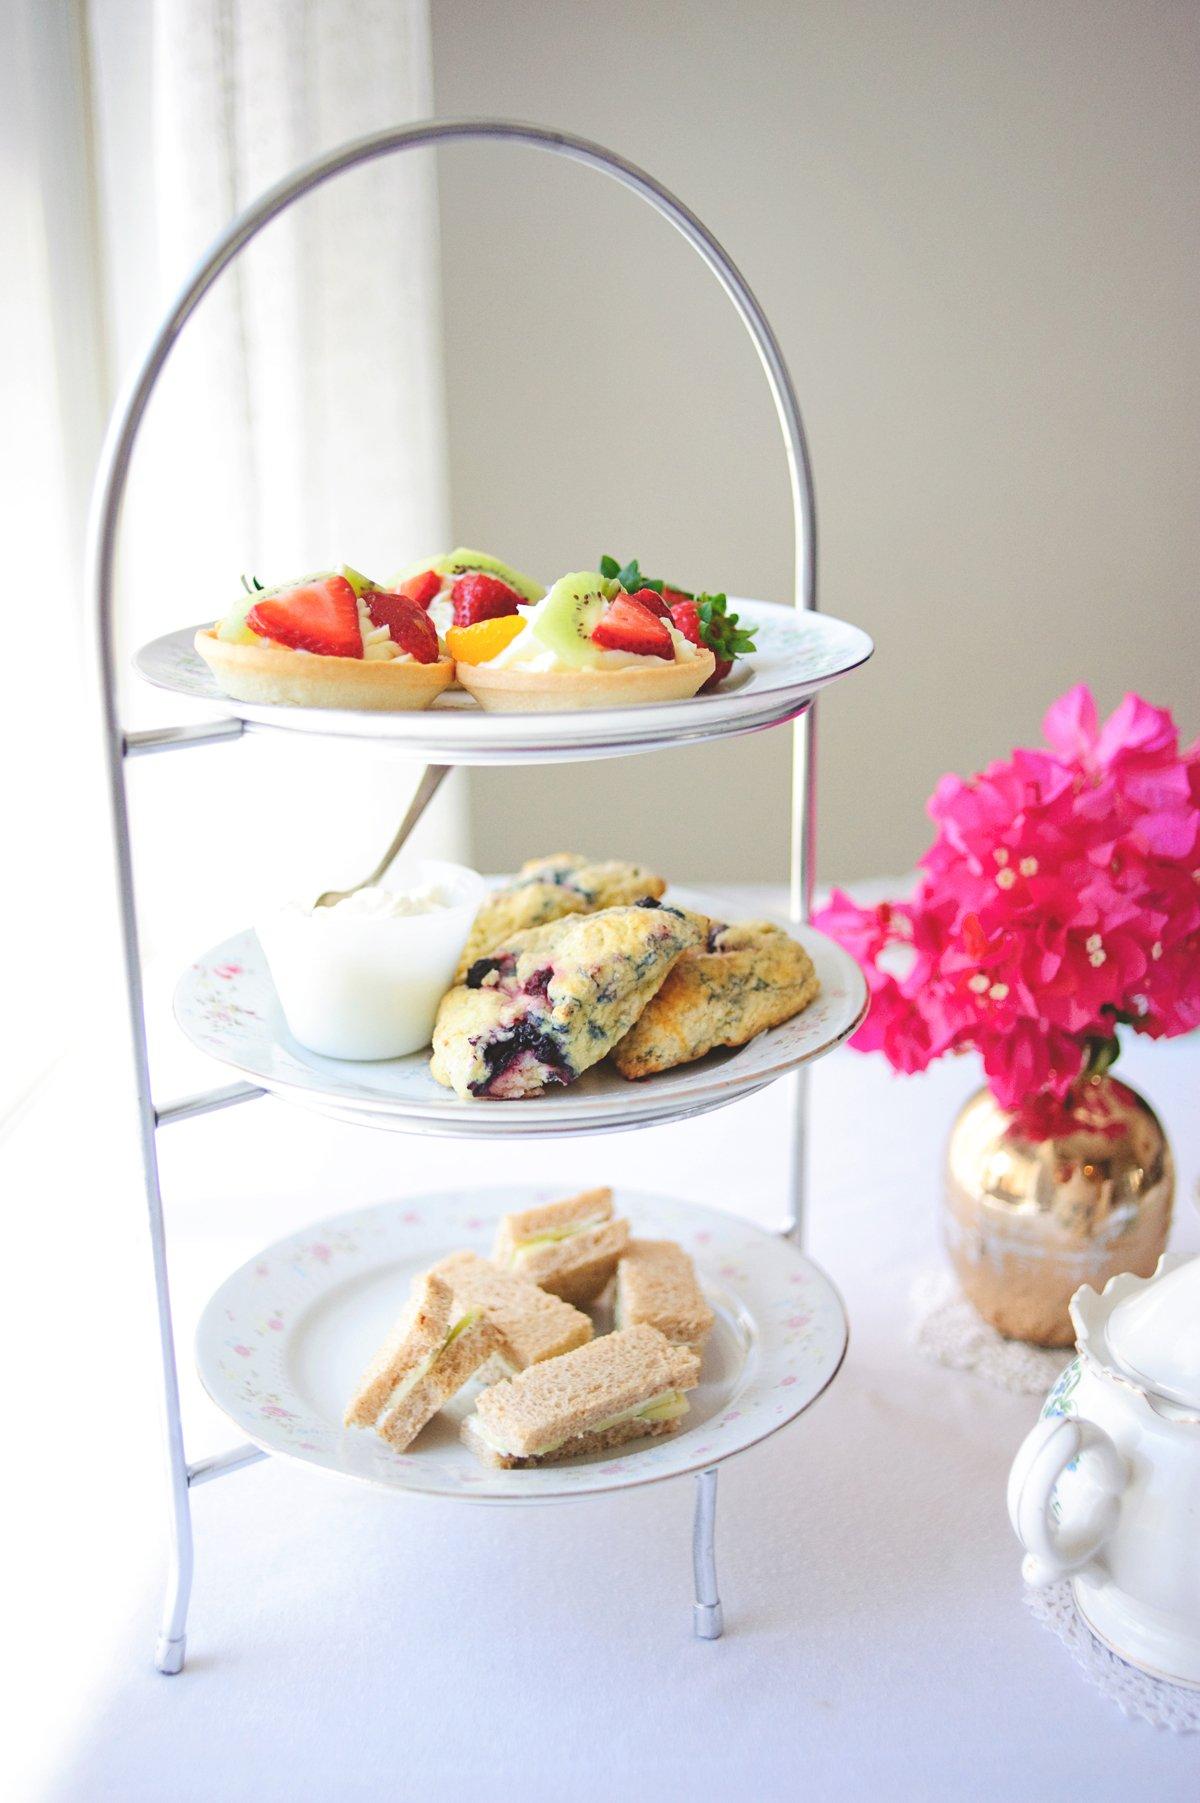 Basic Menu for an elegant Tea Party